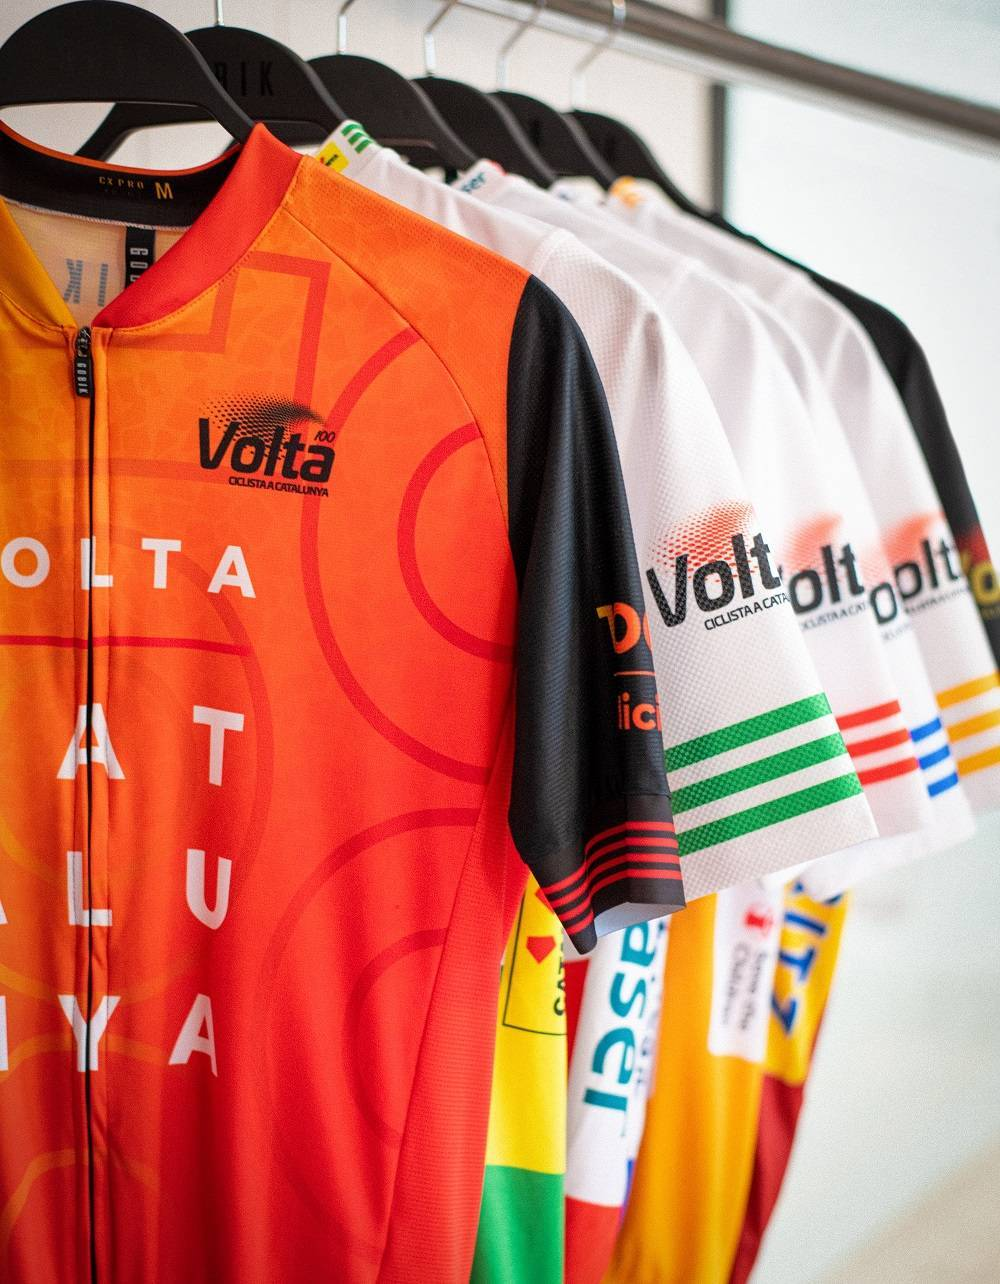 10081 - Volta a Cataluña 2021, la edición centenaria